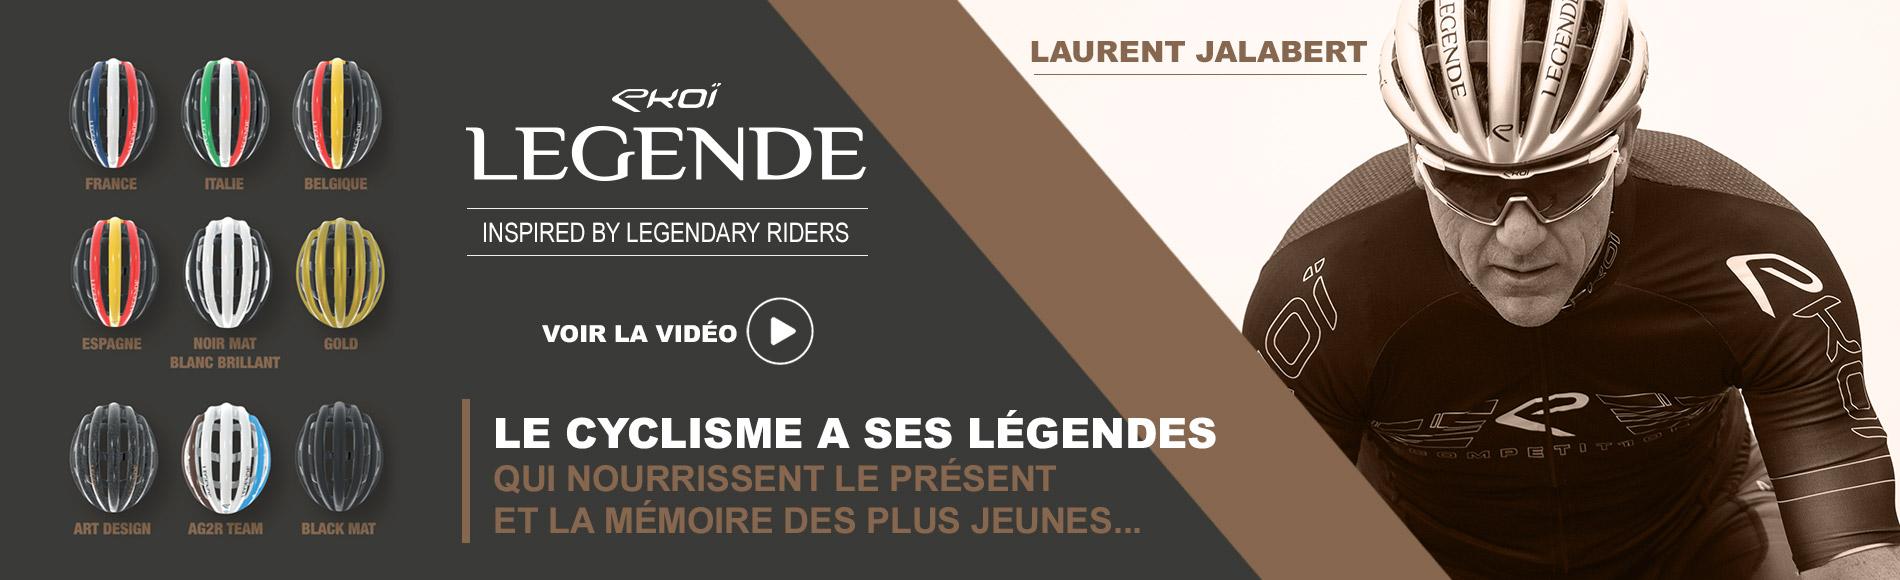 Caque EKOI LEGENDE Laurent Jalabert